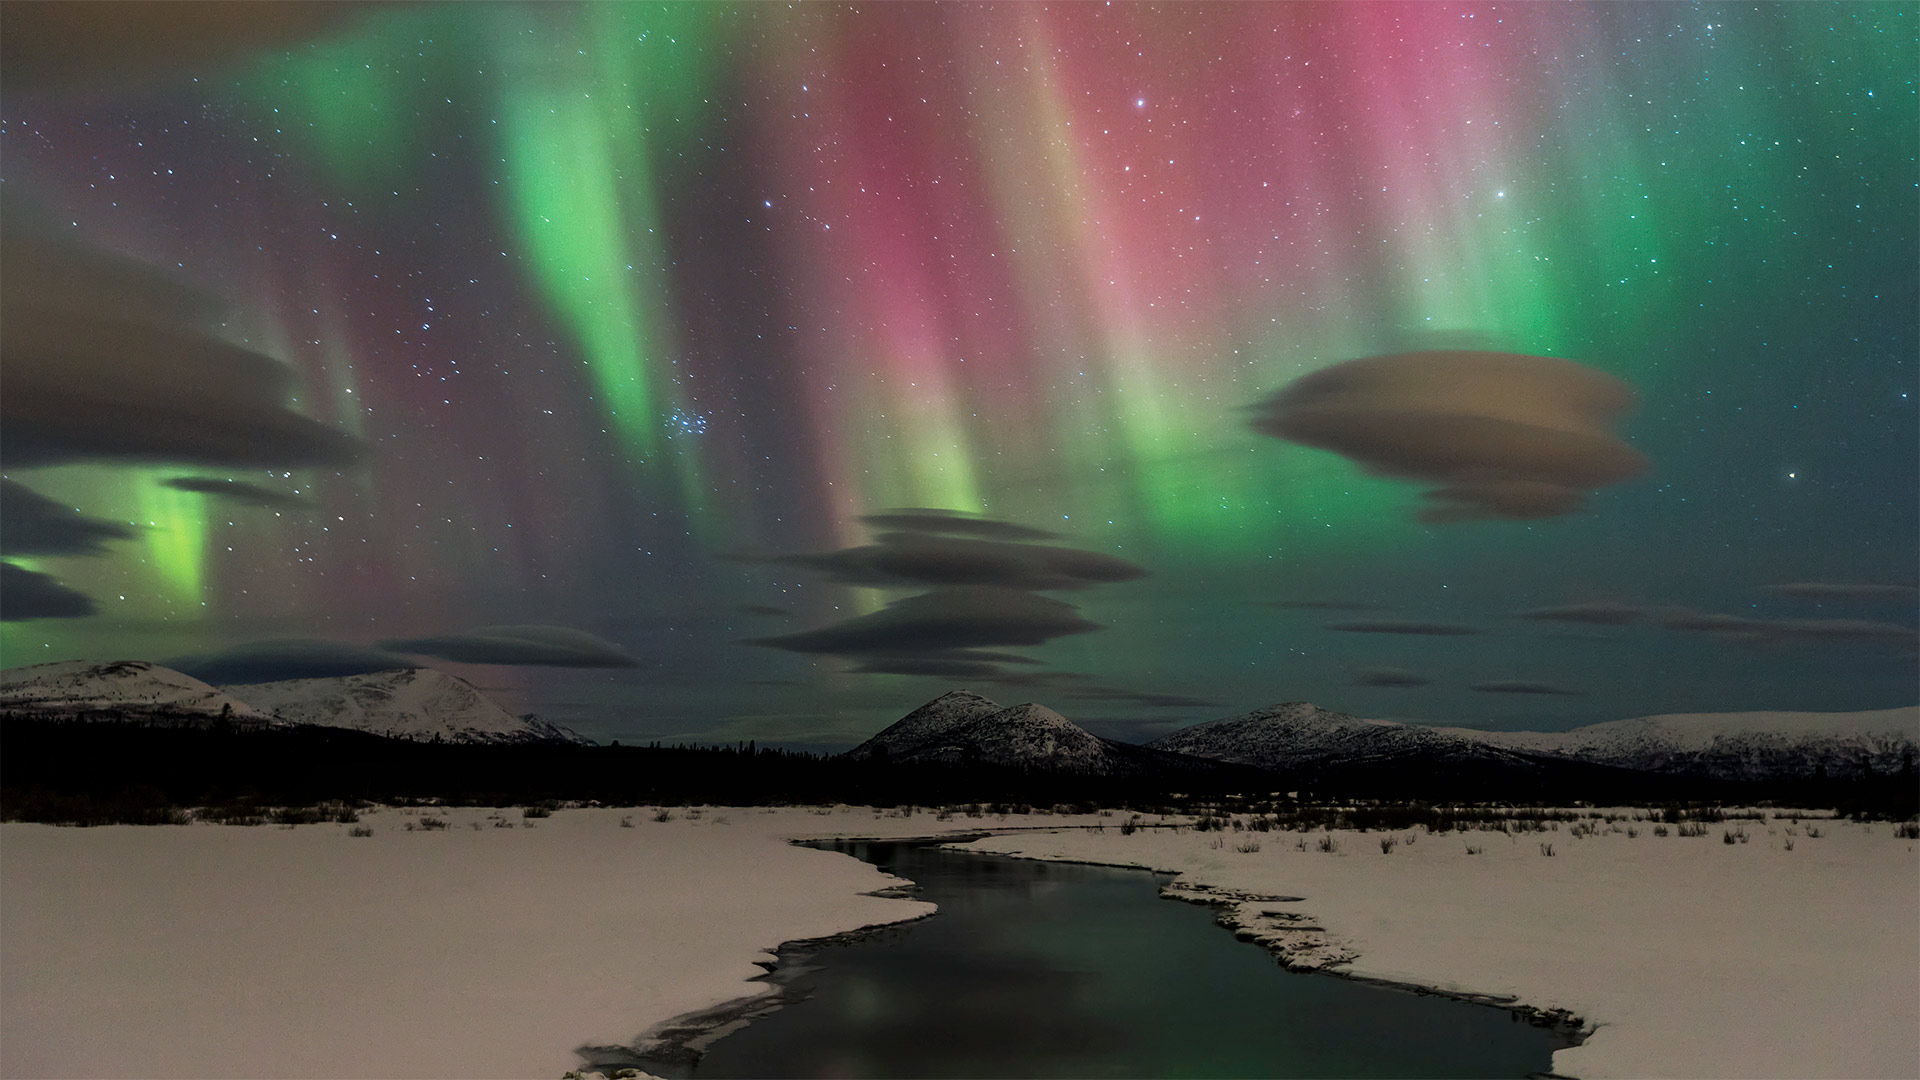 Northern lights near Whitehorse in Yukon, Canada (© Design Pics/Danita Delimont)